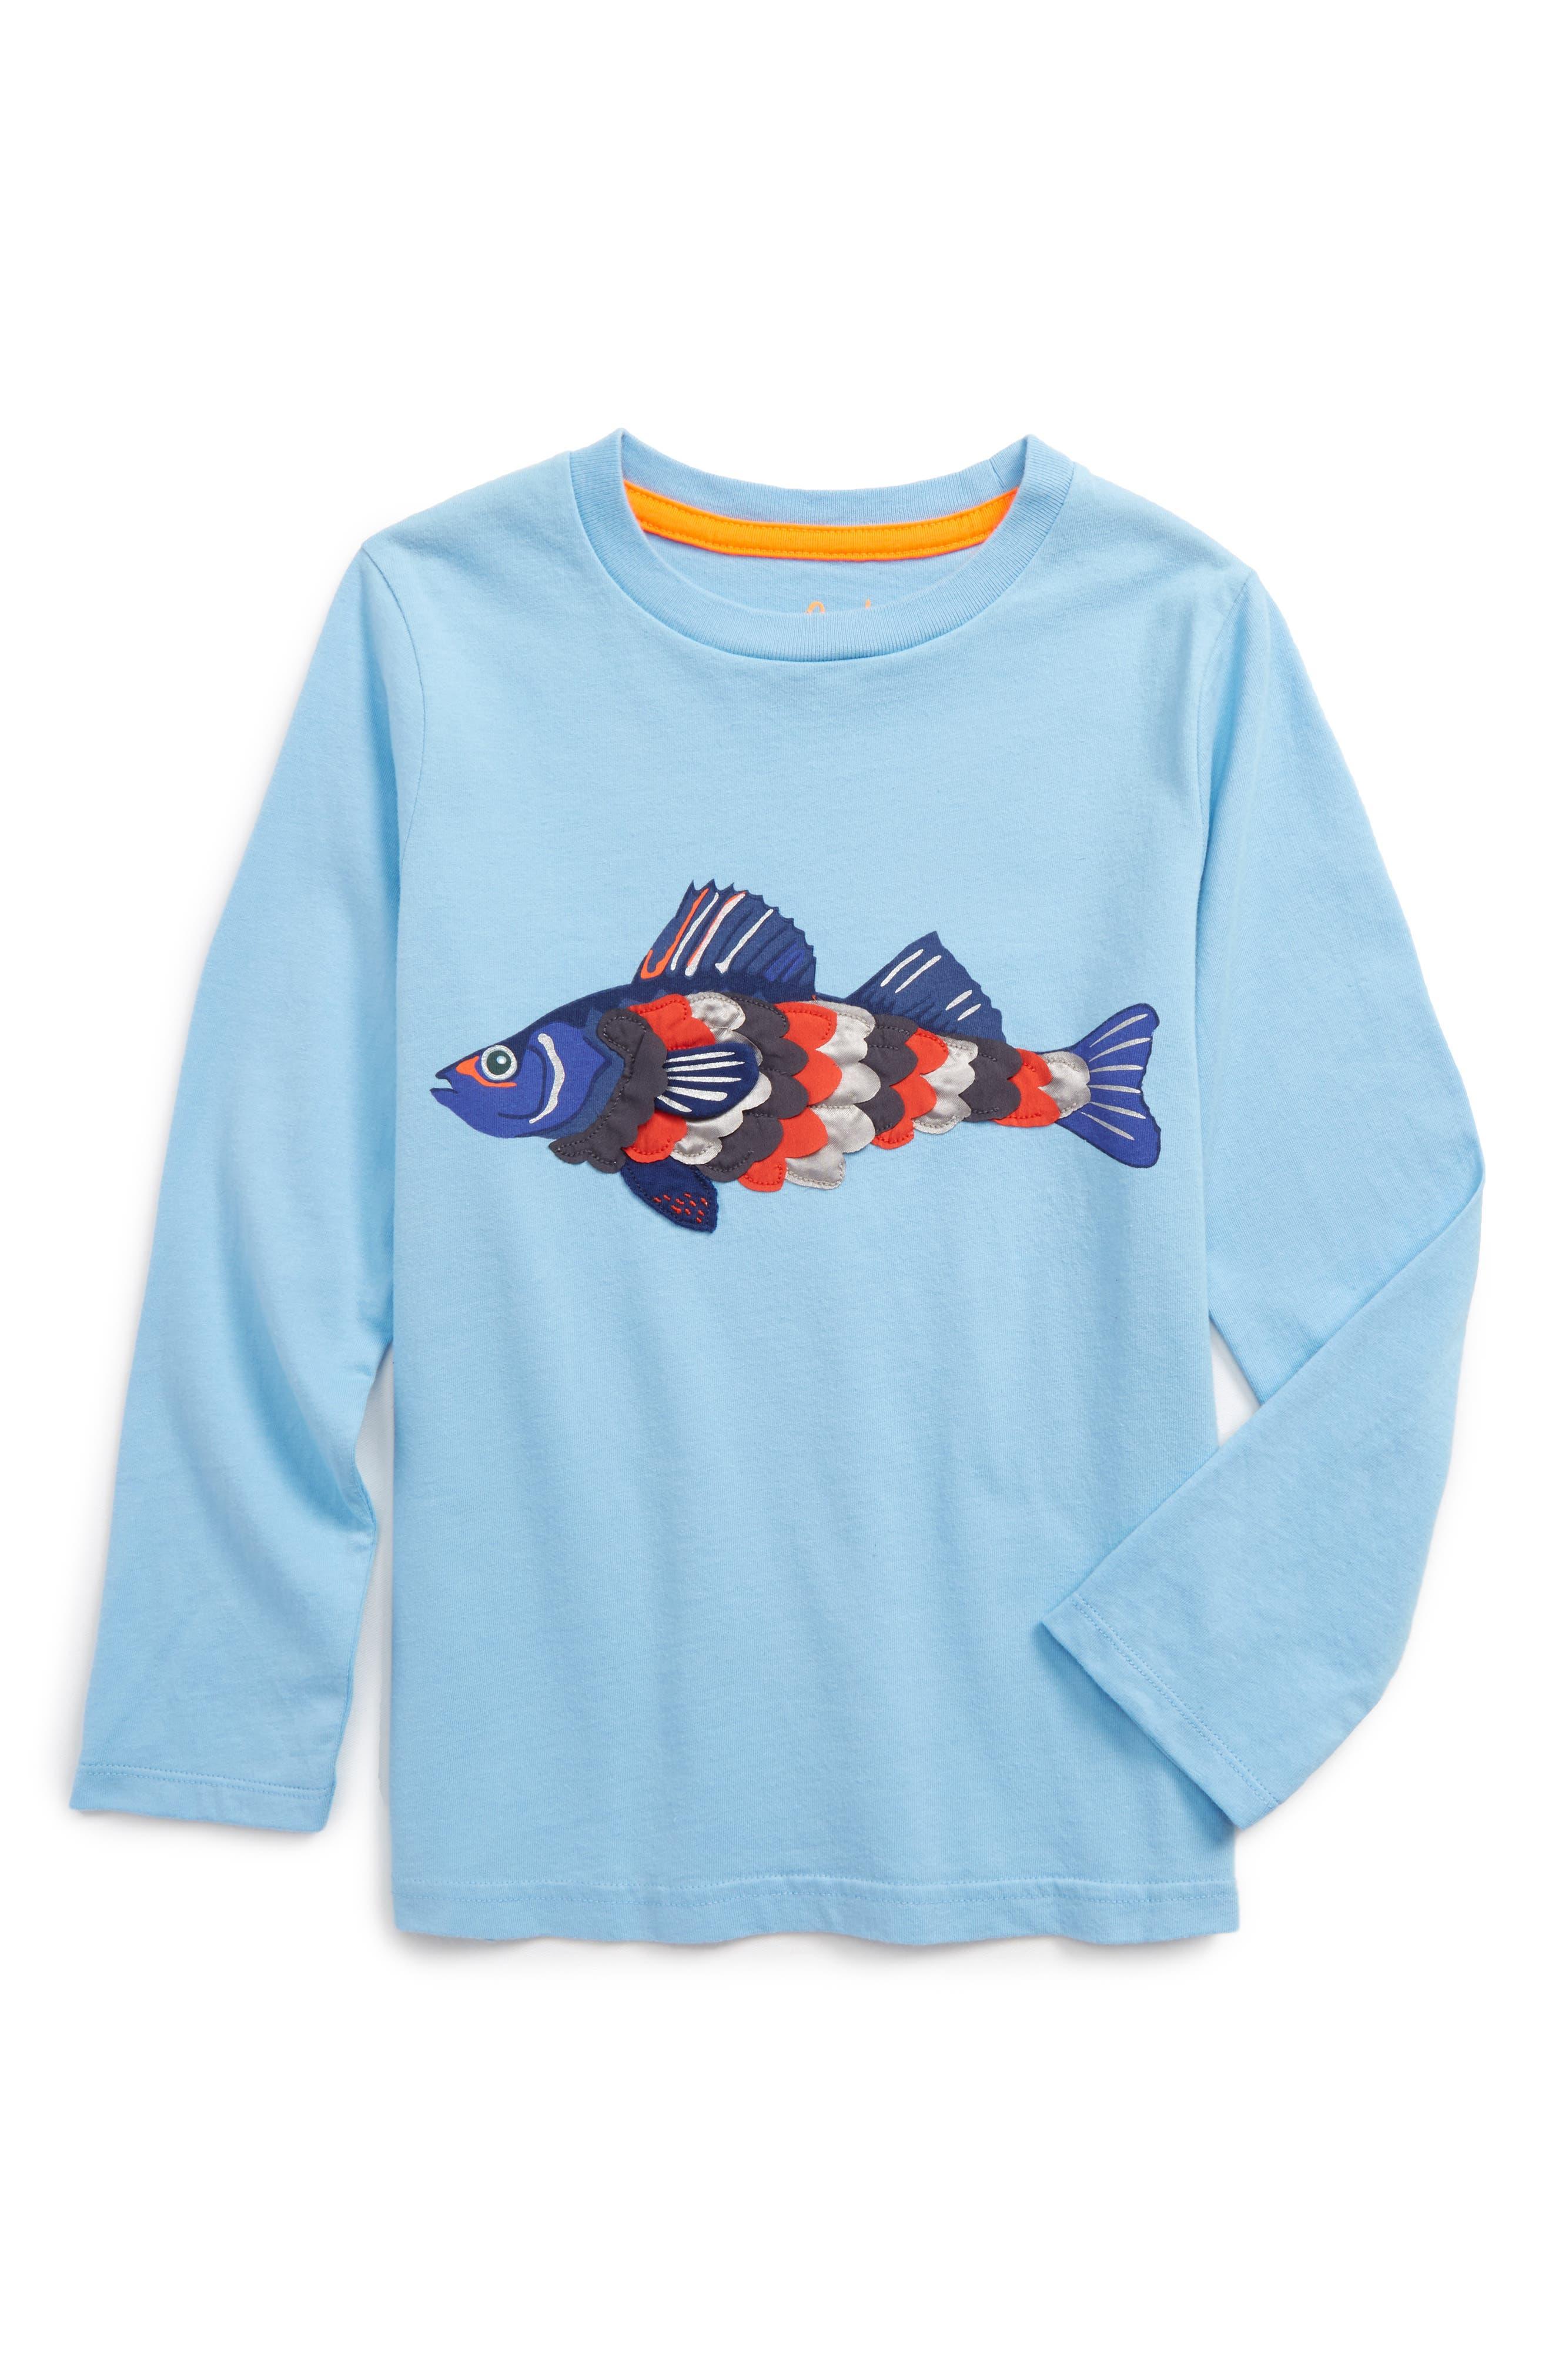 Alternate Image 1 Selected - Mini Boden Textured Creature T-Shirt (Toddler Boys, Little Boys & Big Boys)